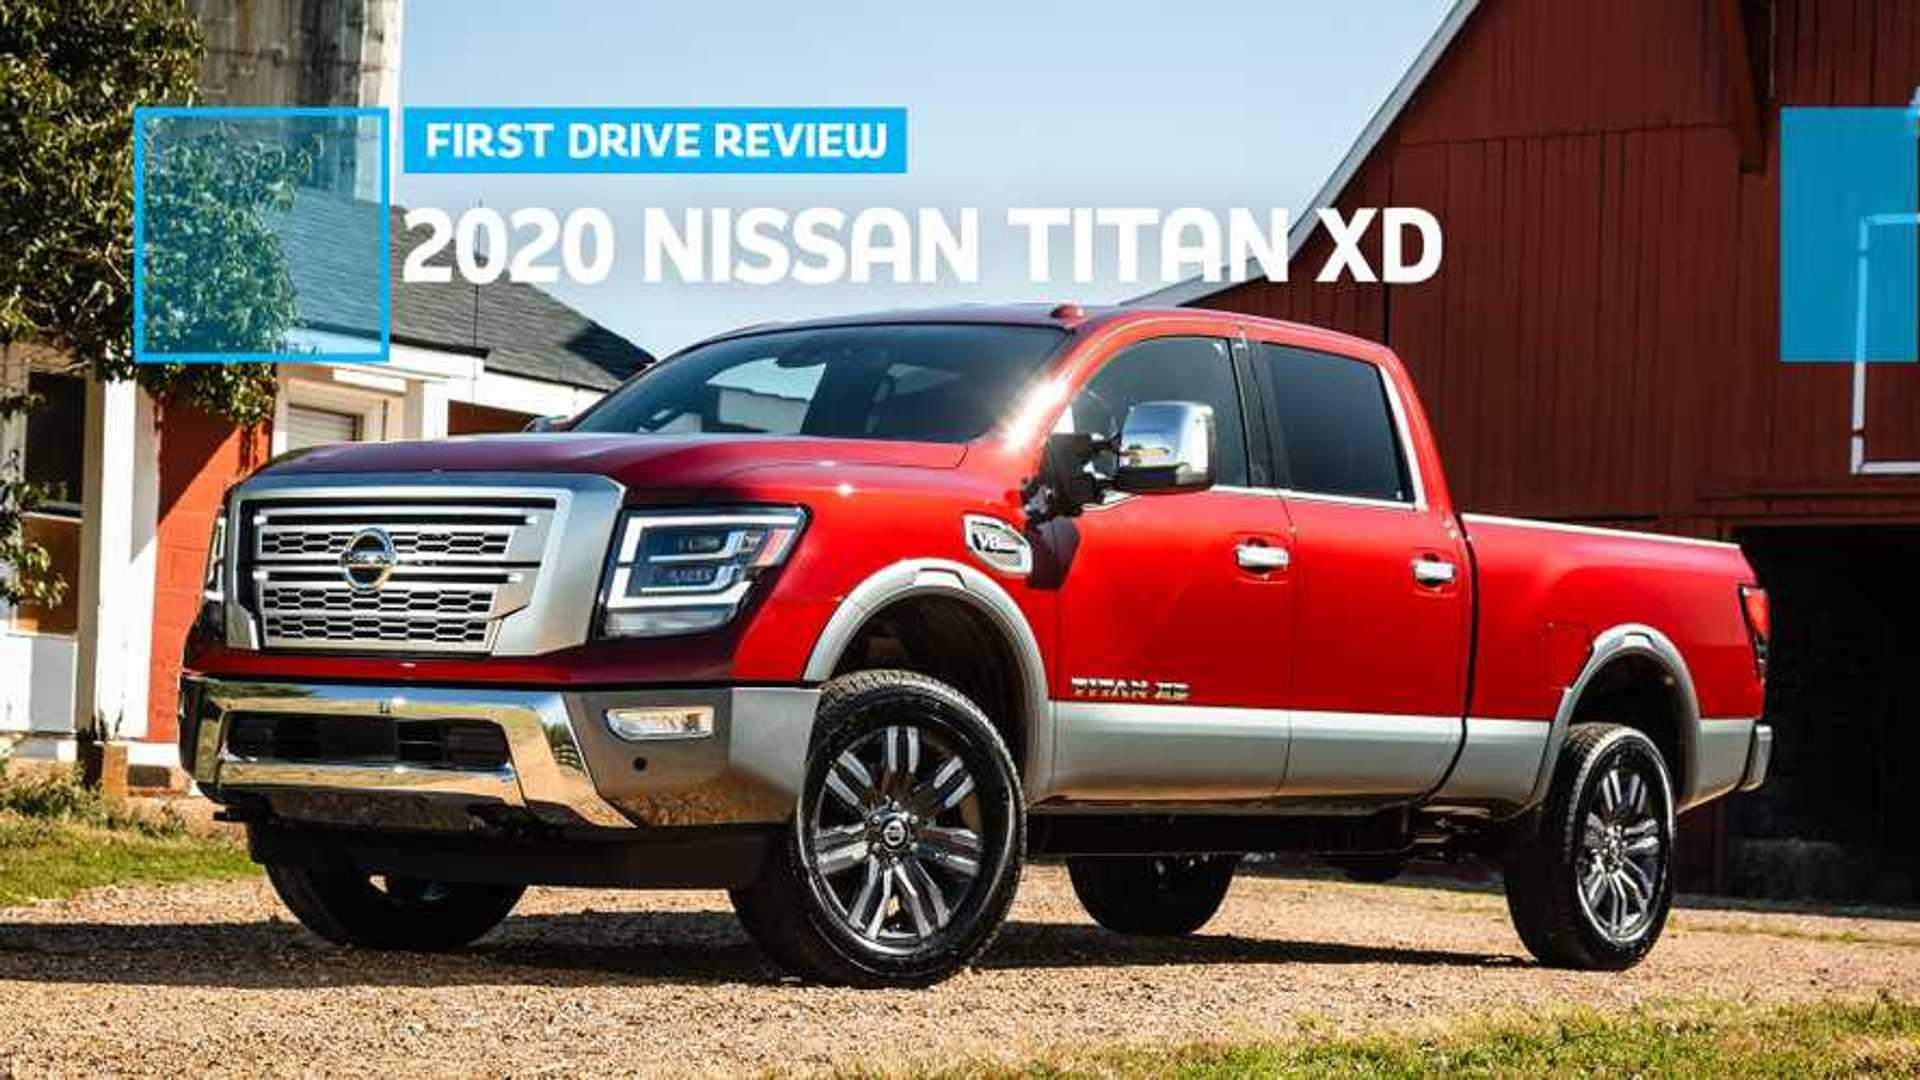 2020 Nissan Titan Xd First Drive Review Still Fighting